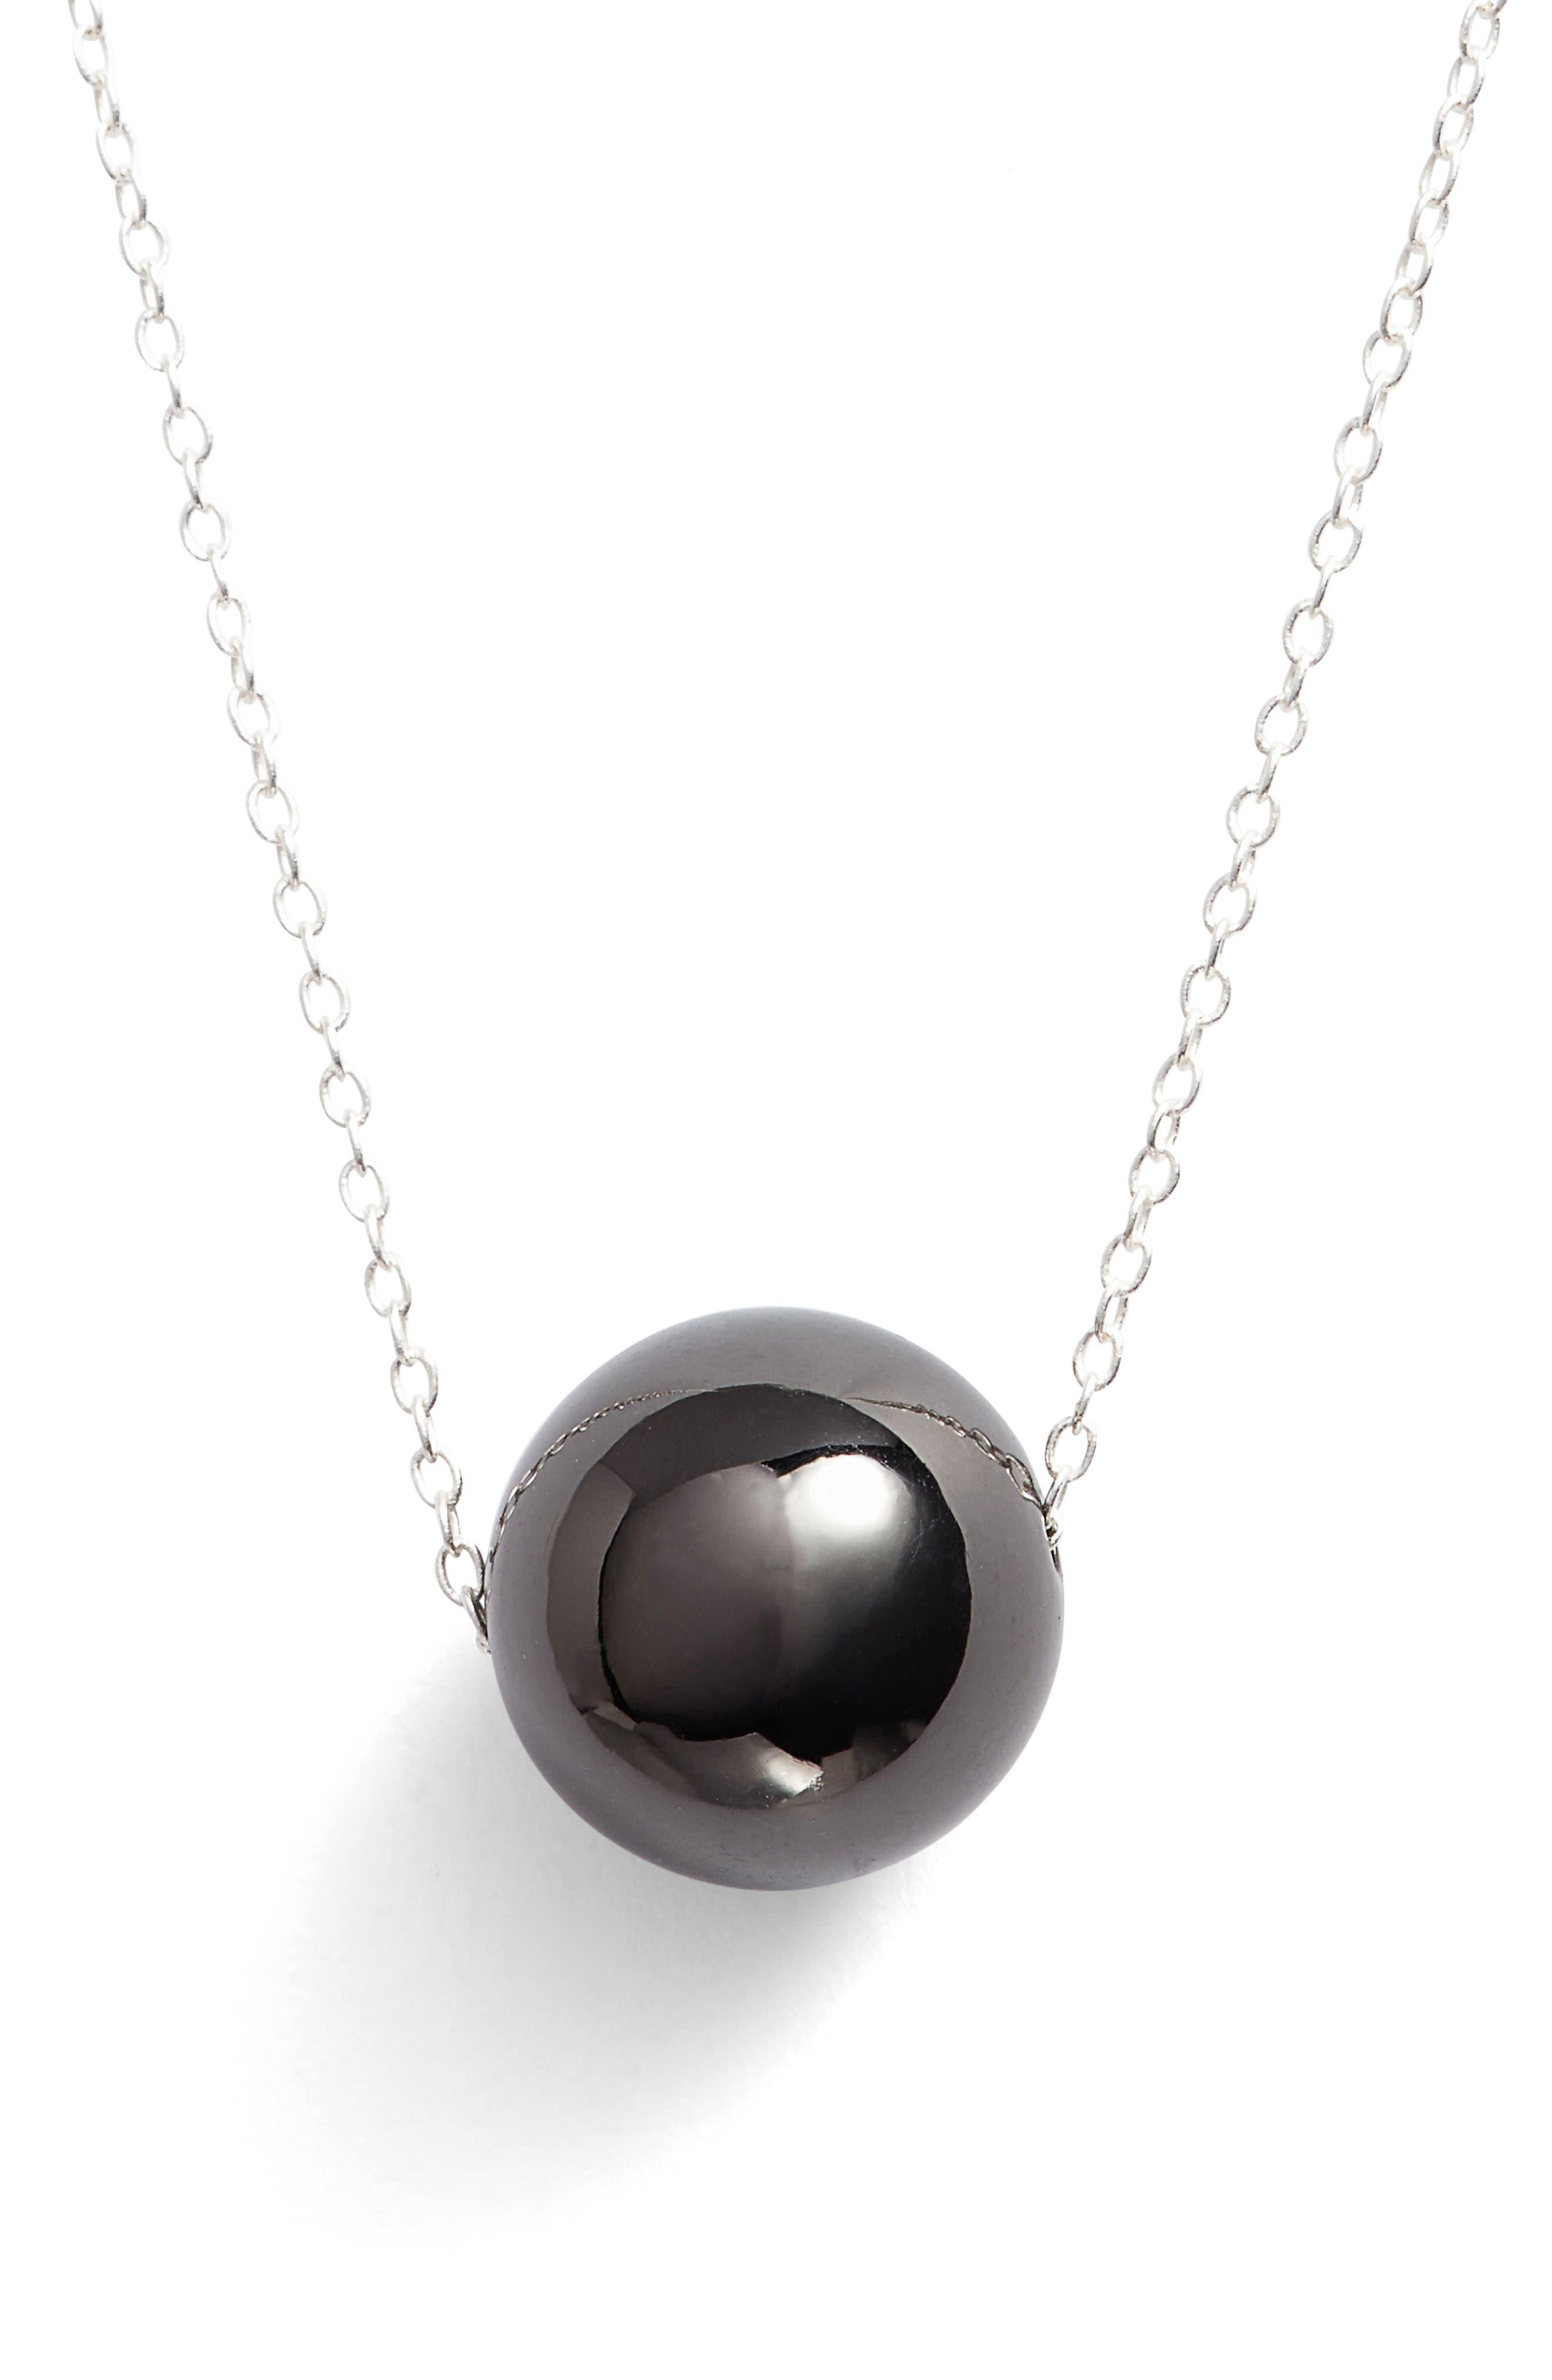 Sphere Pendant Necklace,                         Main,                         color, Silver